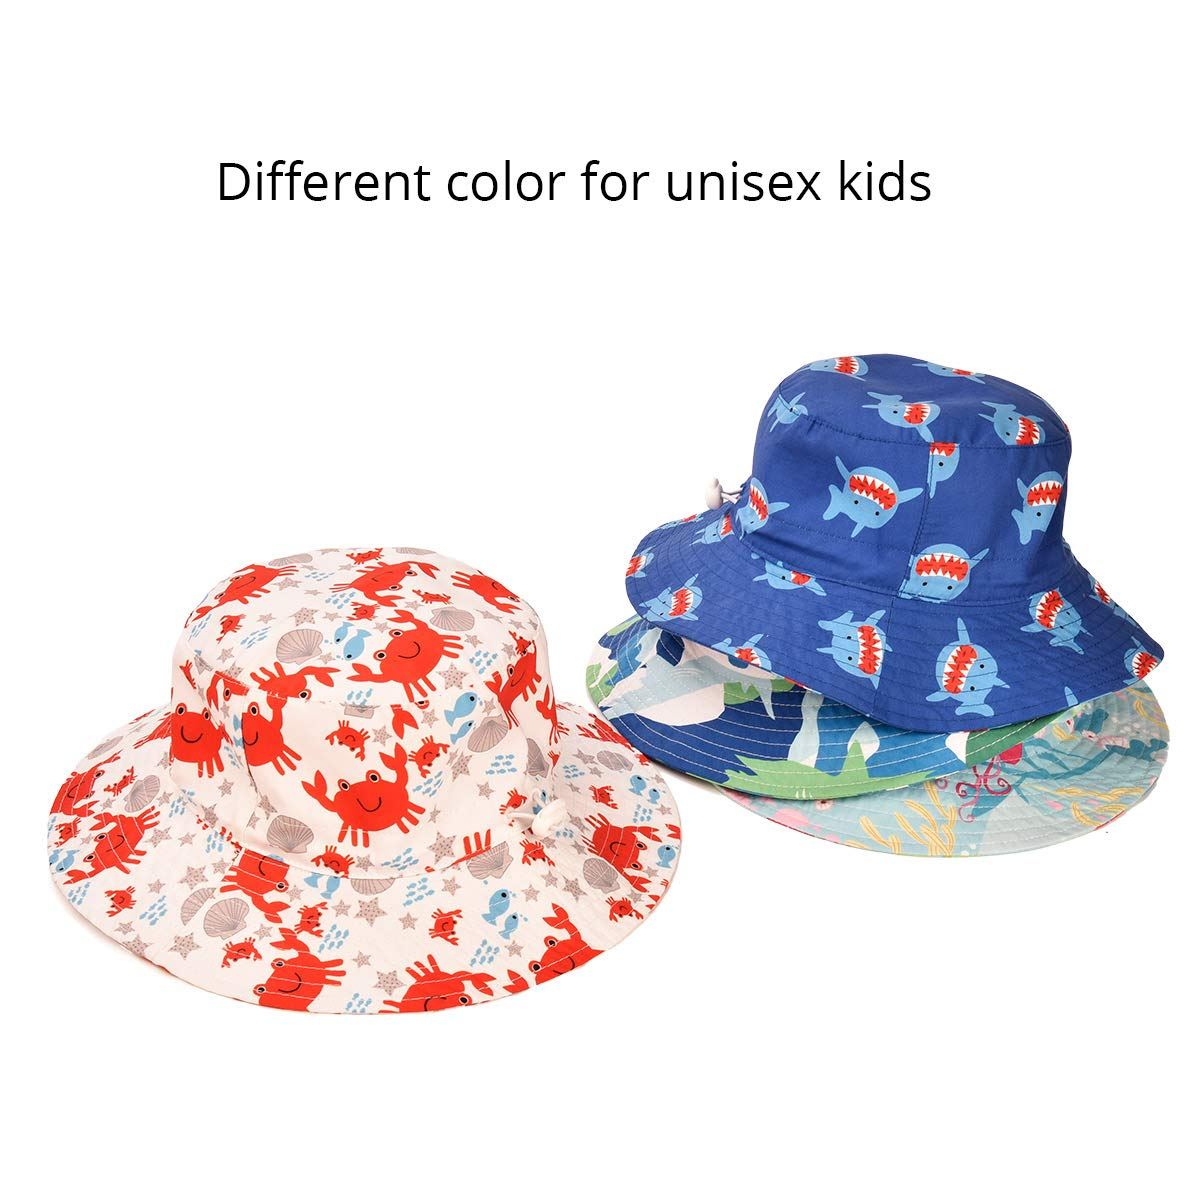 3276261c0dfb1 Amazon.com  SOMALER Toddler Kids Sun Hats Baby Wide Brim UV Sun Protection  Beach Hat Boys Girls Summer Bucket Cap  Clothing